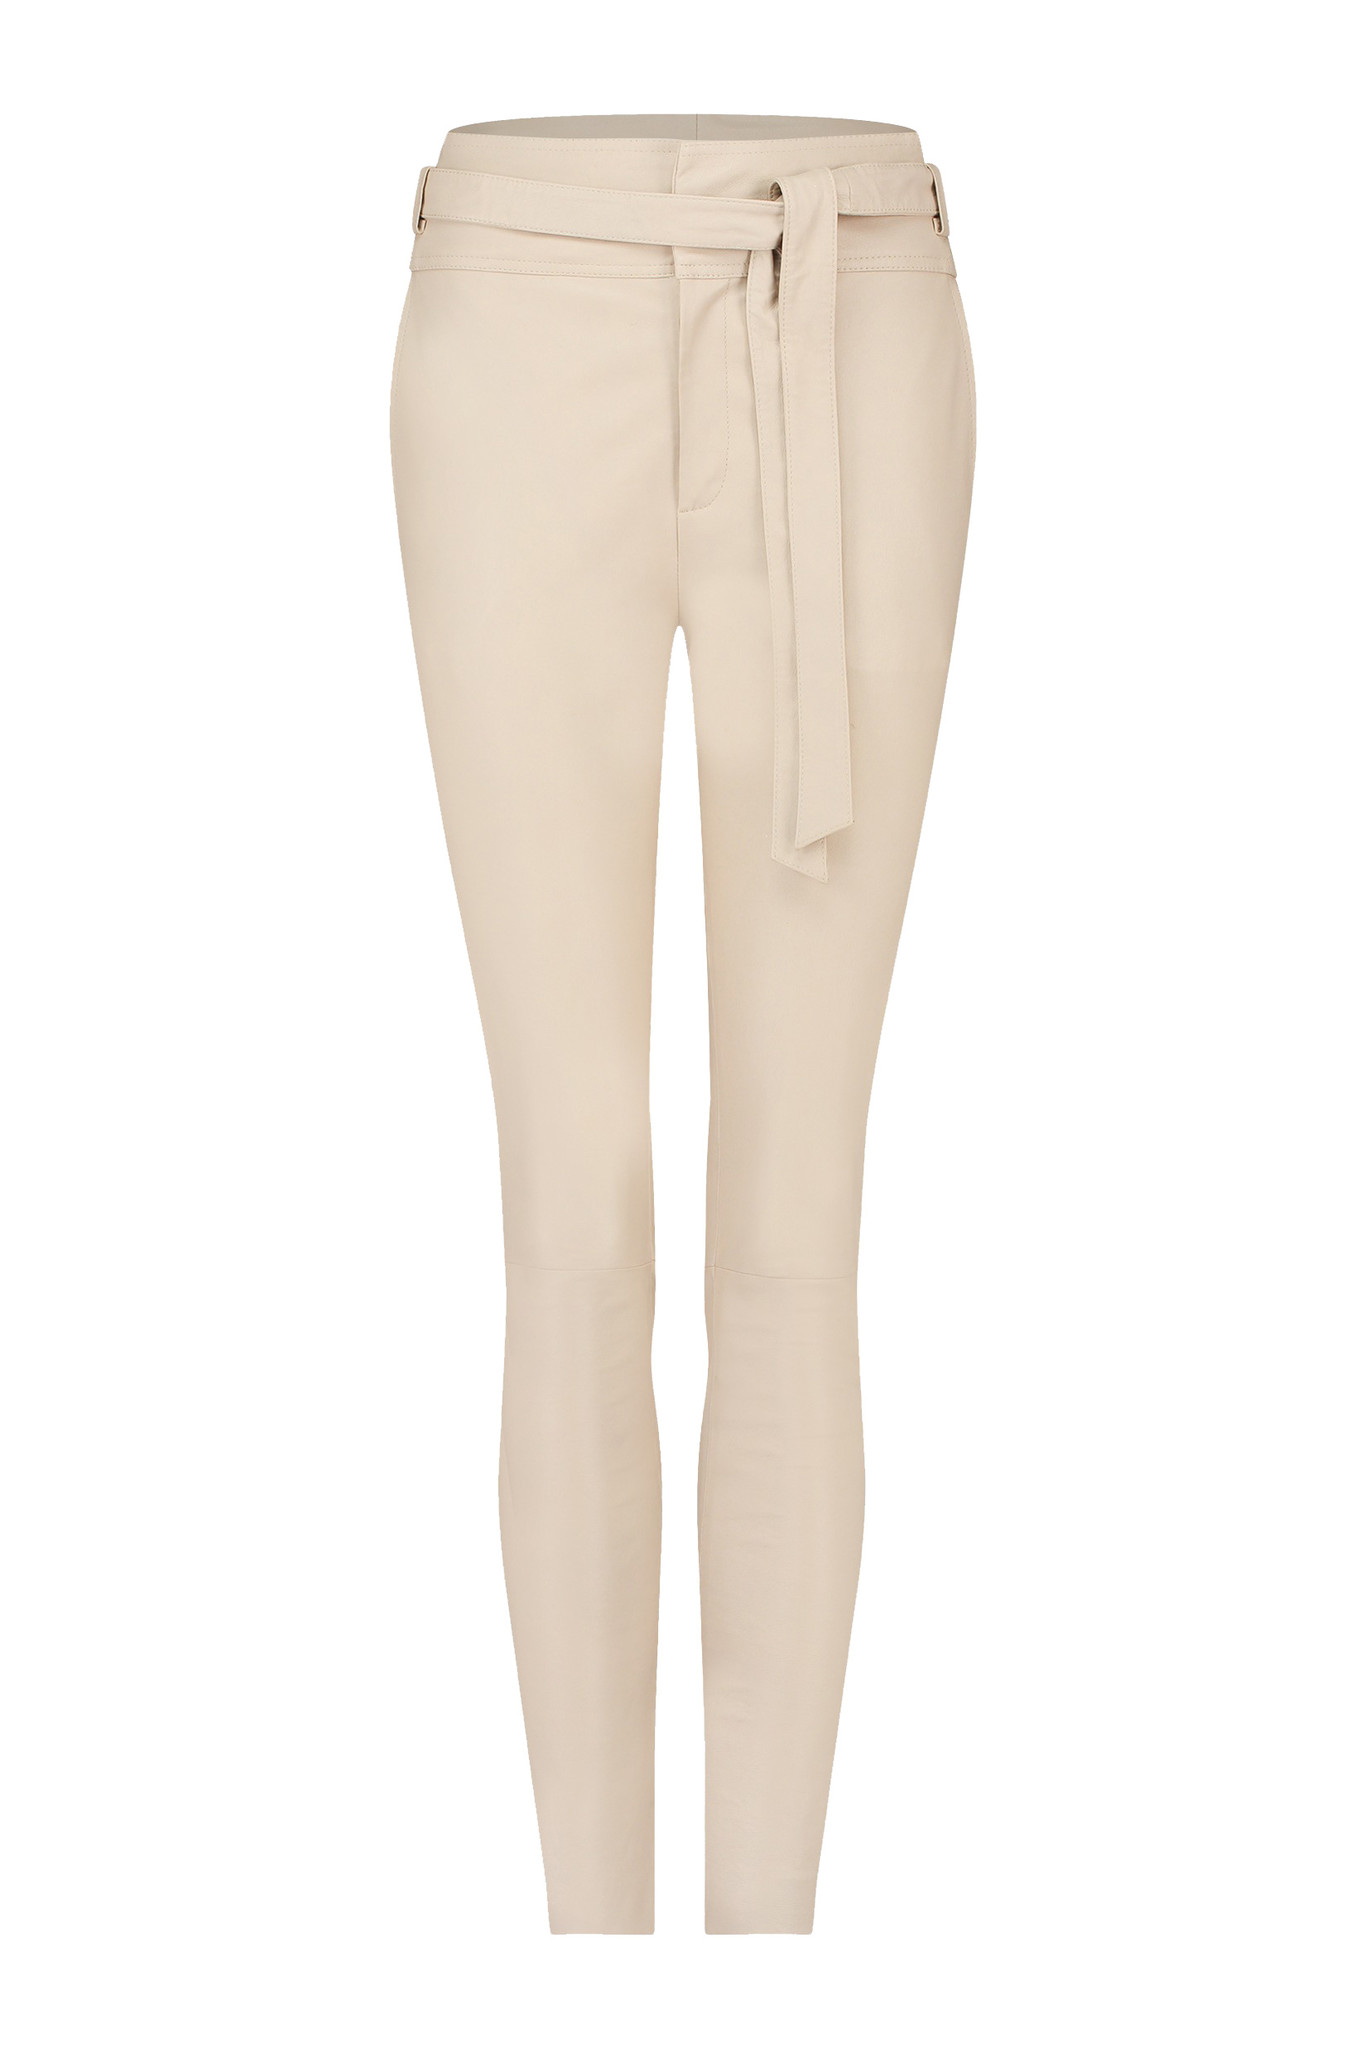 Ann Leather Pant - White Sand-1